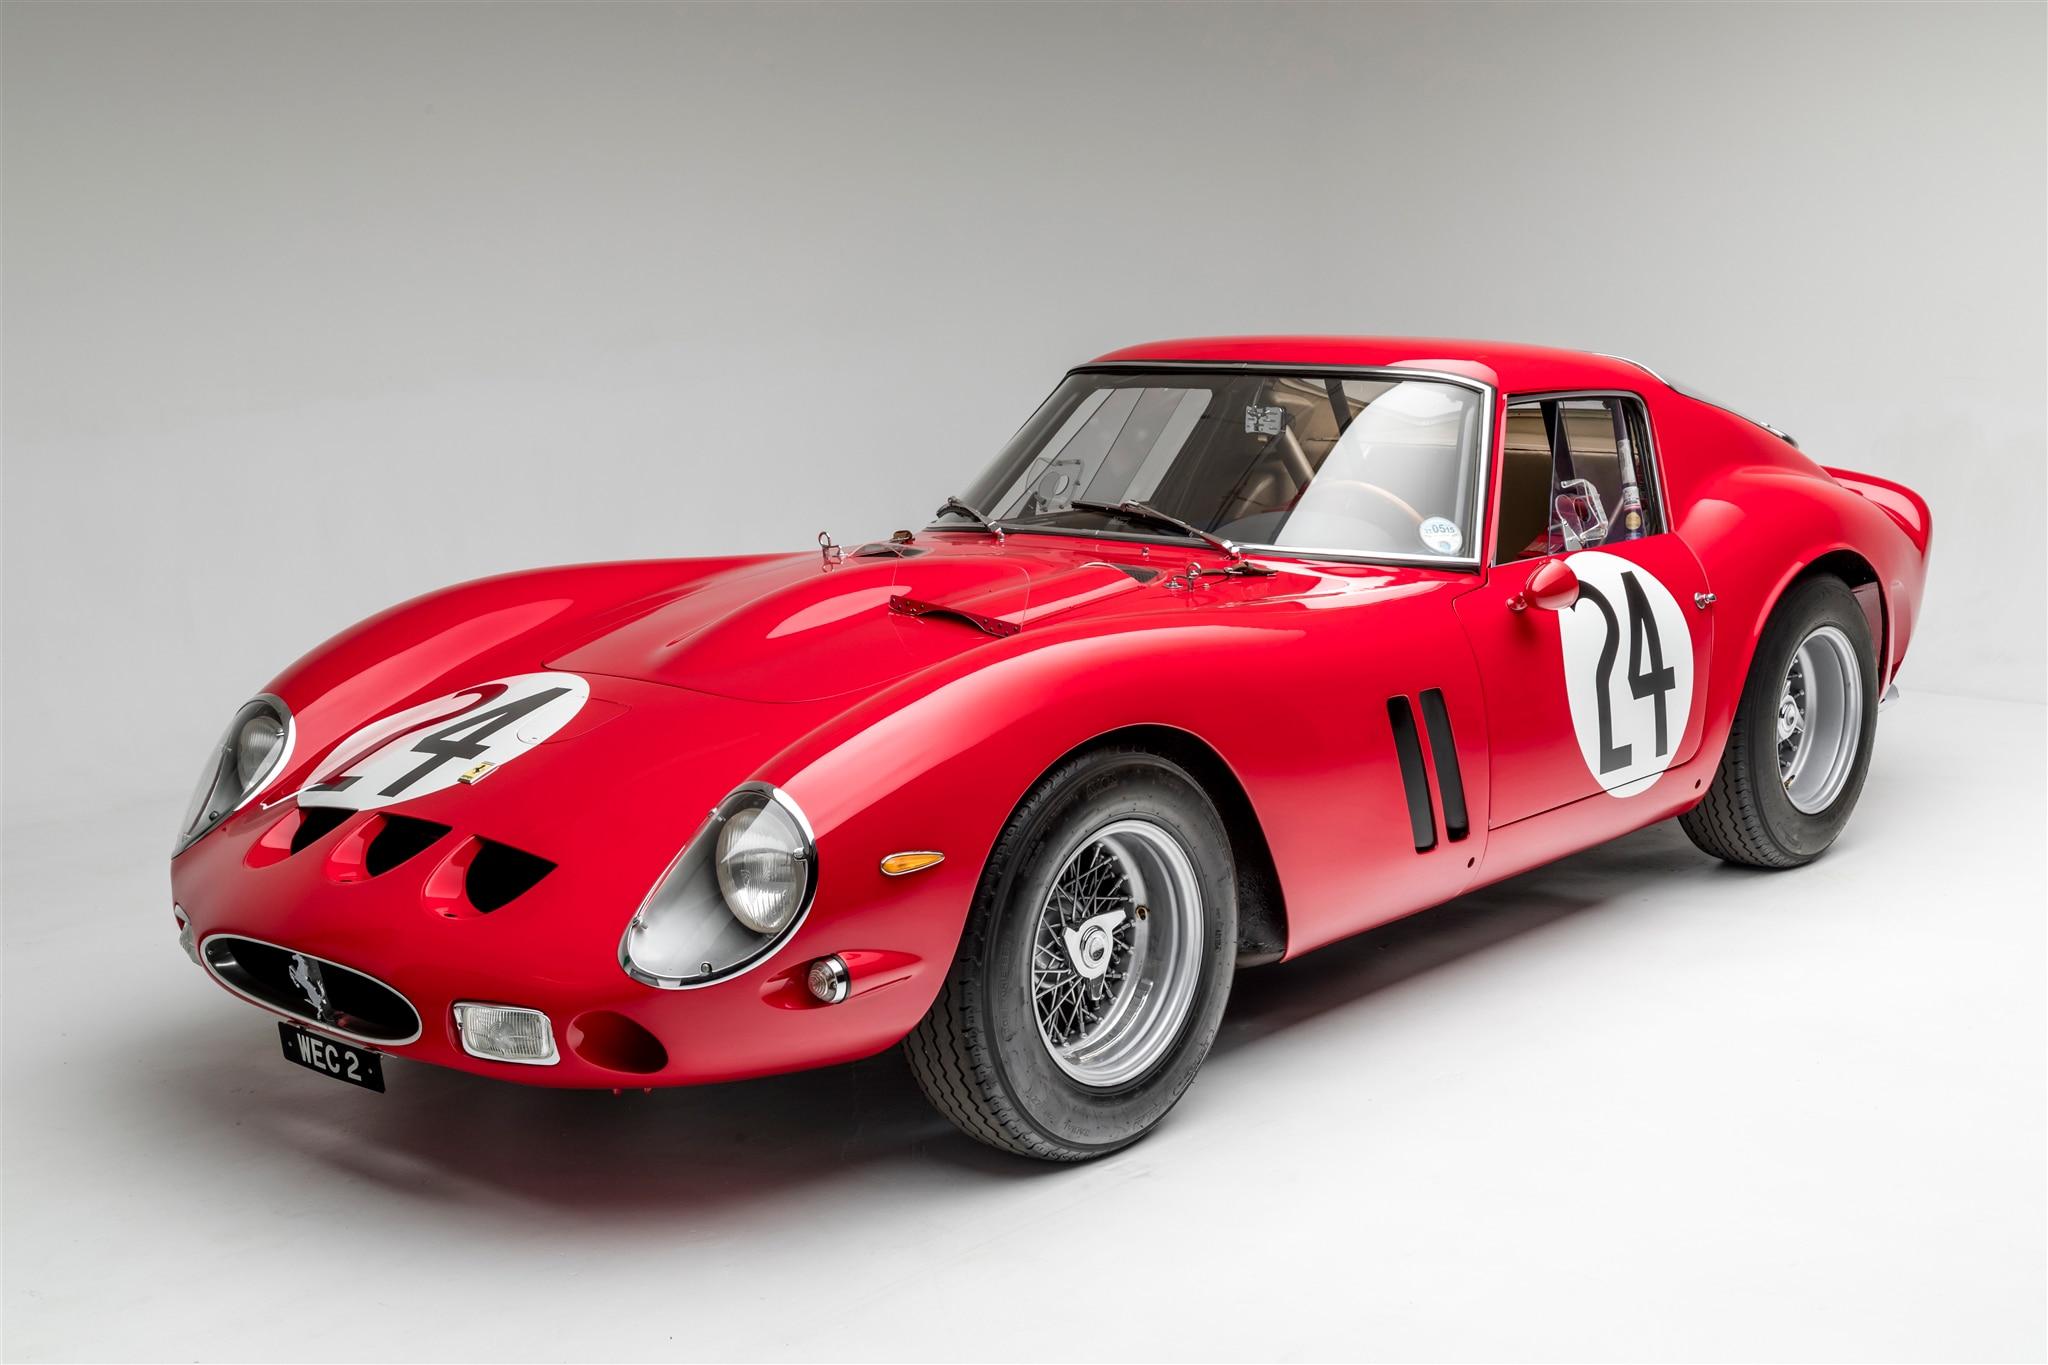 1963 Ferrari 250 GTO Front Three Quarter